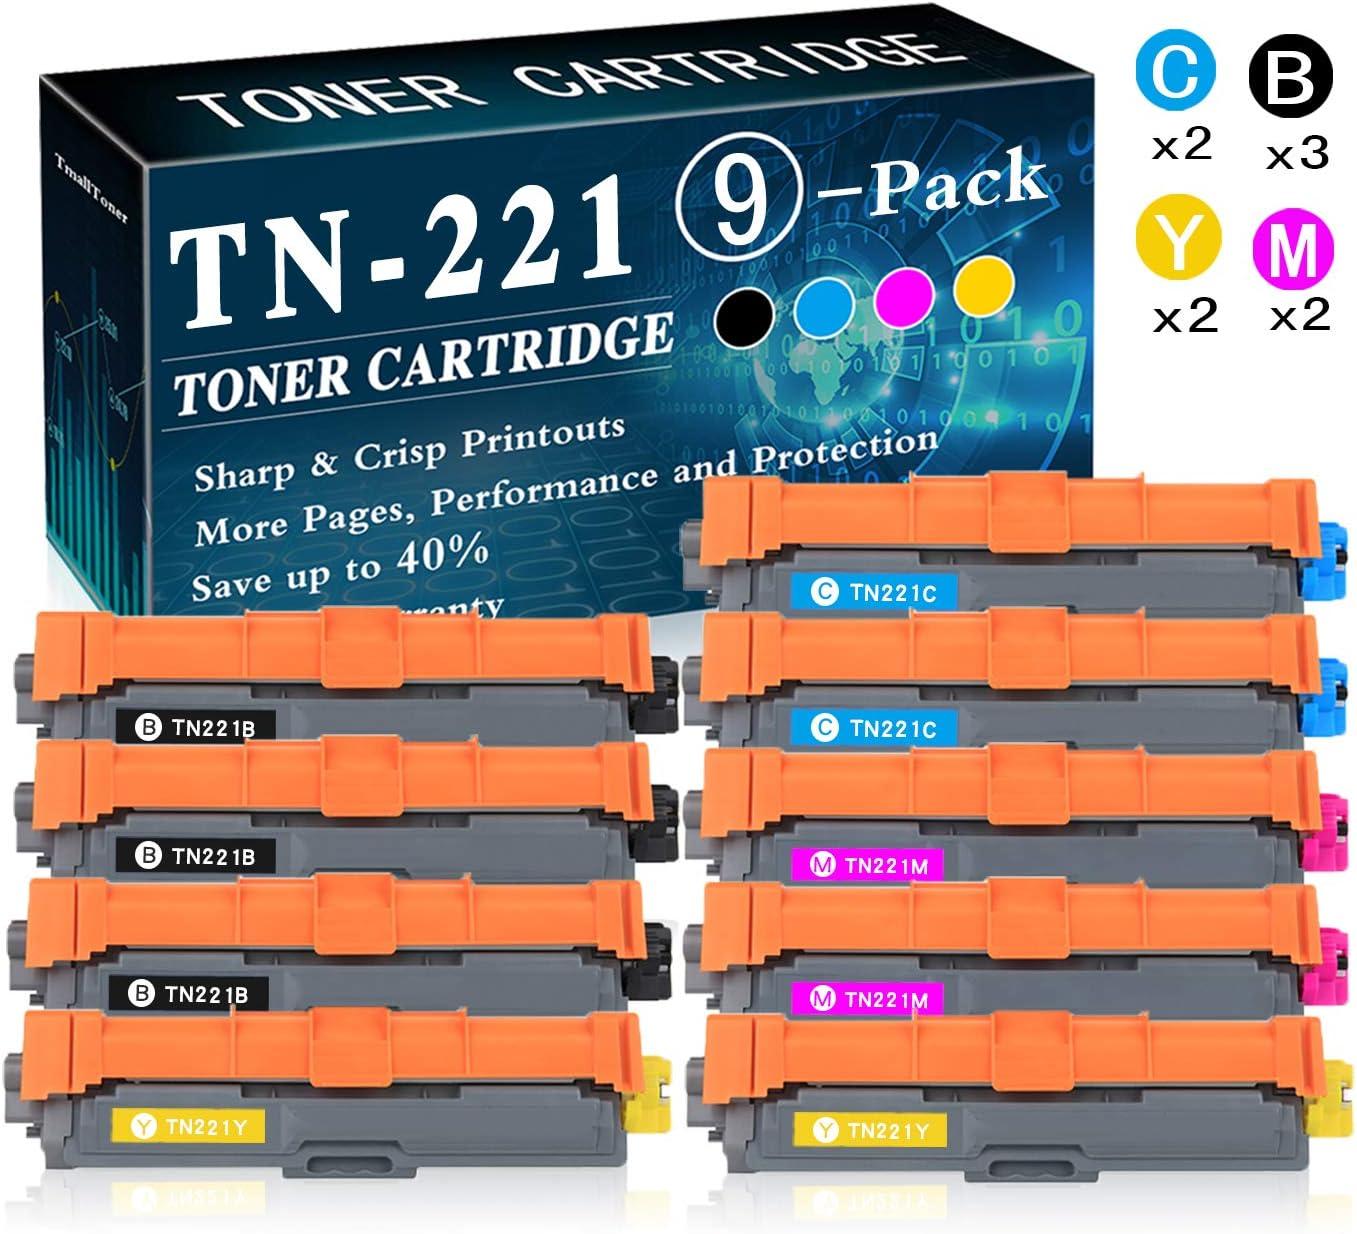 TN-221 Toner Cartridge Replacement for Brother Laserjet HL-3140CW HL-3150CDN MFC-9130CW MFC-9330CDW DCP-9015CDW DCP-9020CDN Printer Printer,by TmallToner 9-Pack 3Black,2Cyan,2Magenta,2Yellow